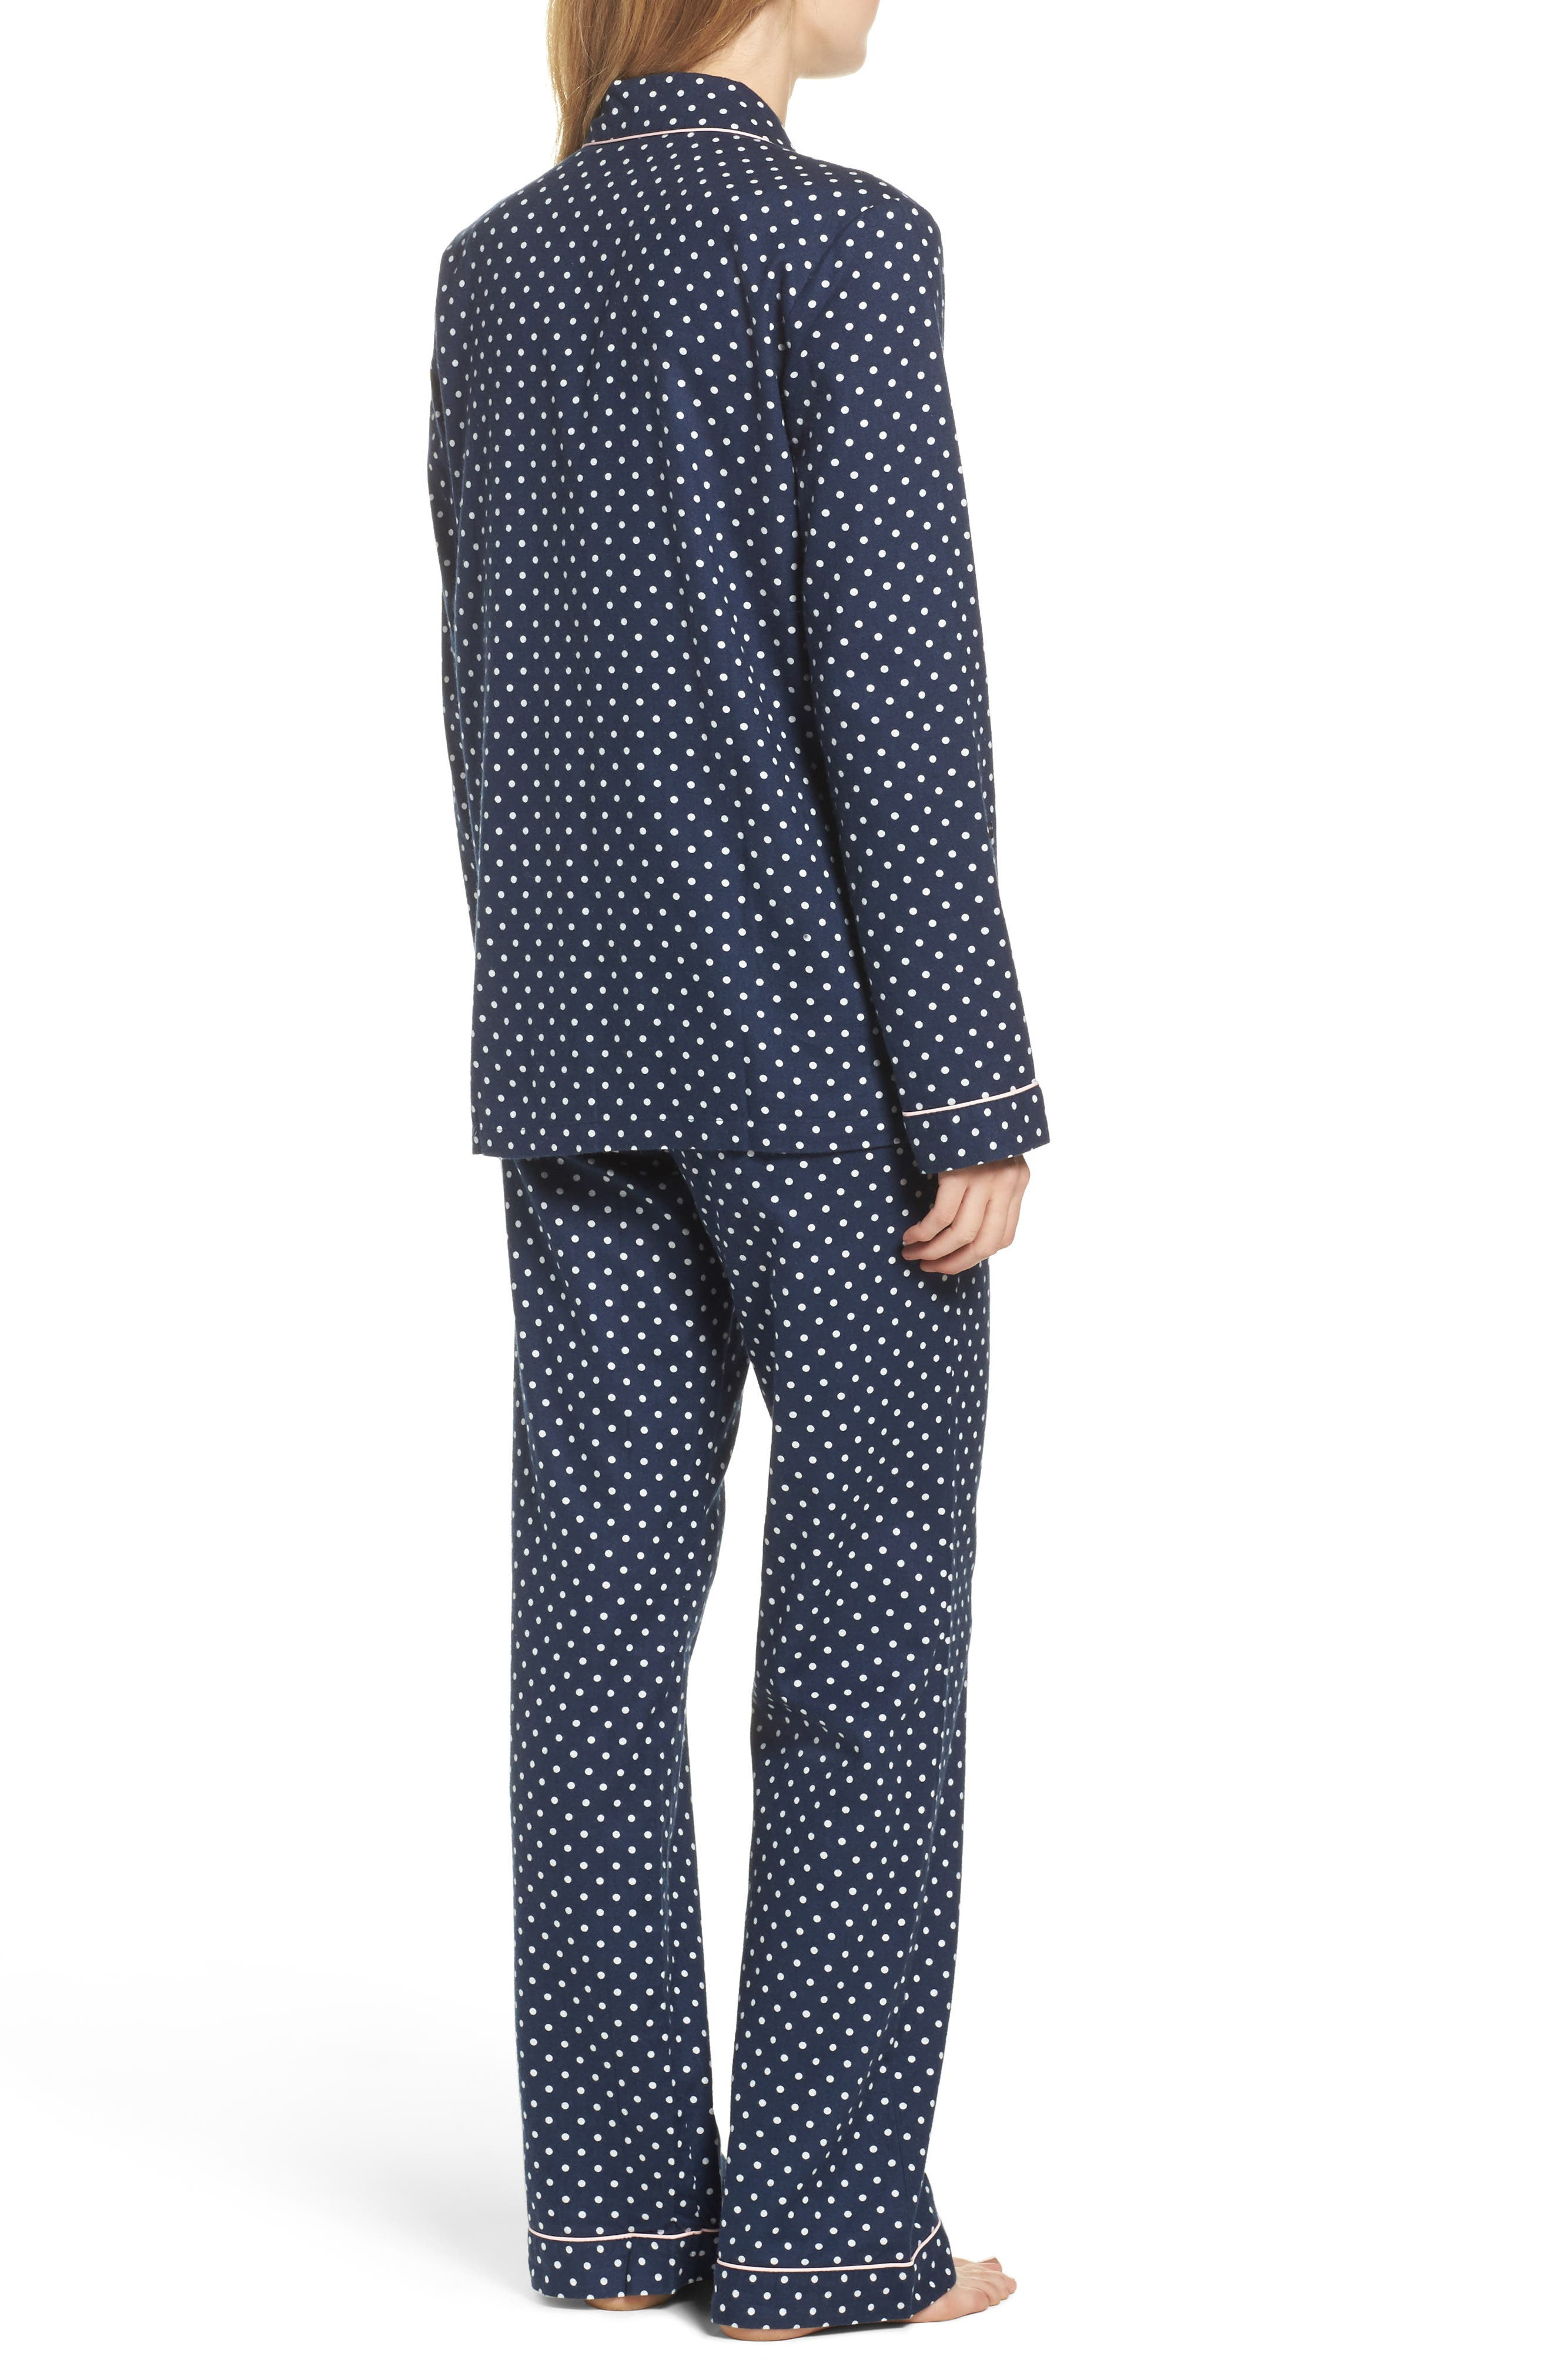 Cotton Twill Pajamas,                             Alternate thumbnail 11, color,